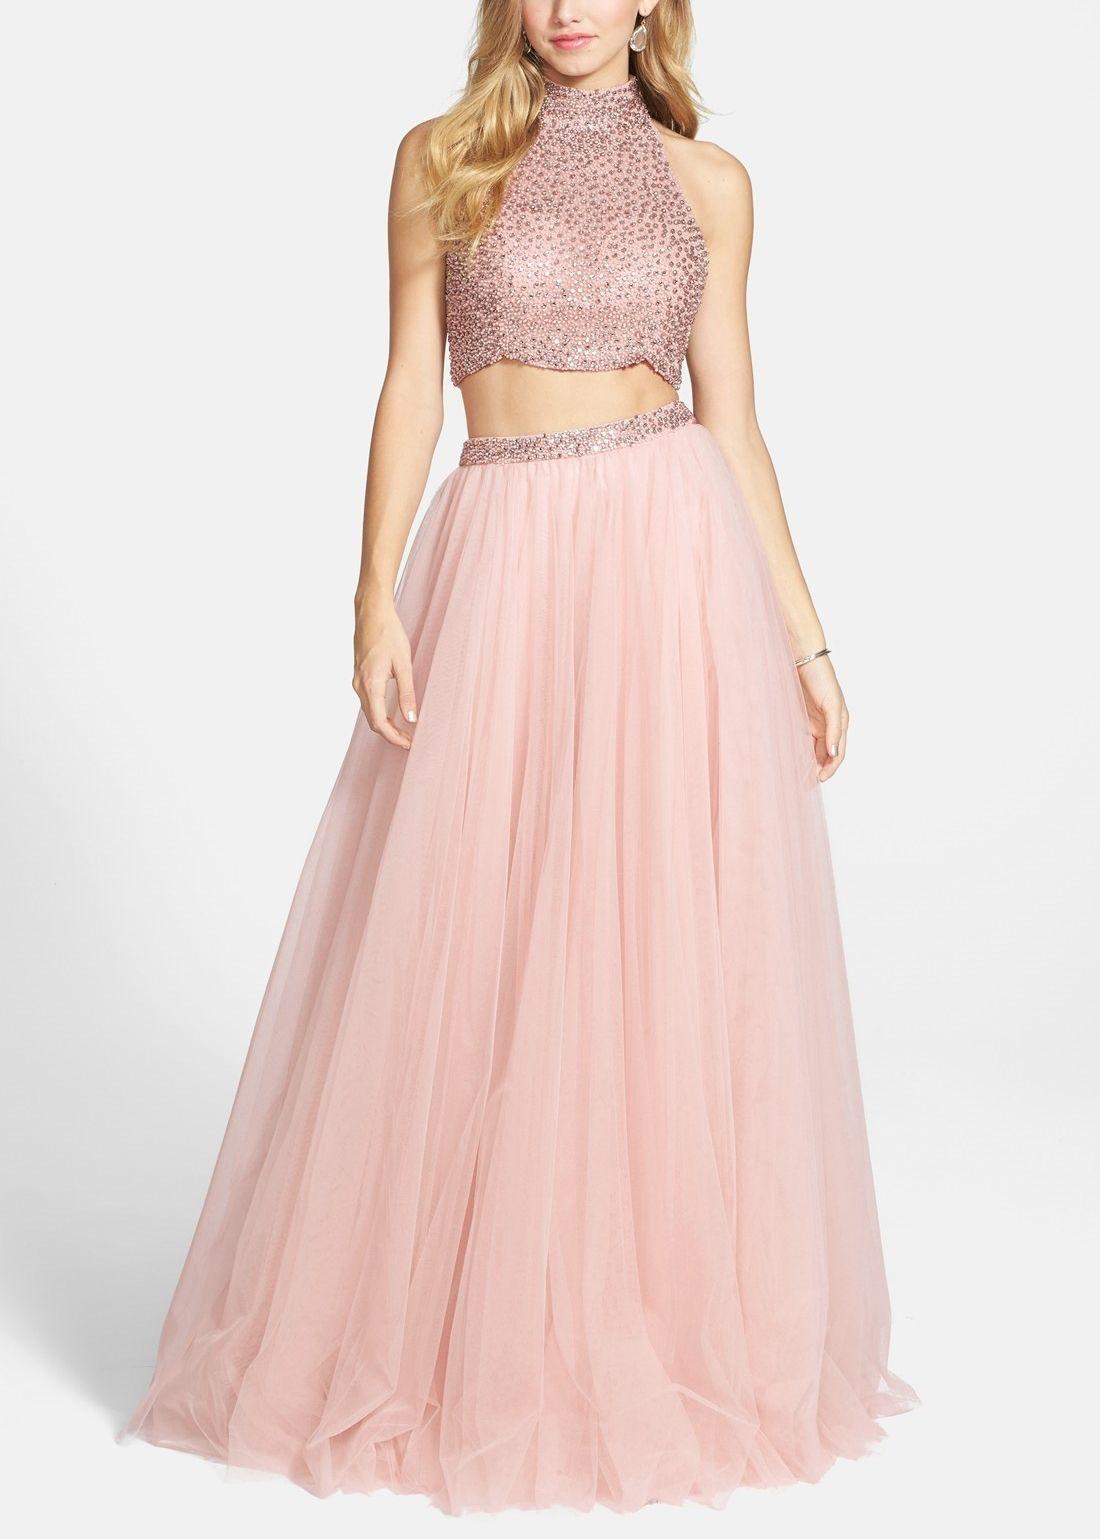 Prom Princess | Embellished crop tank & chiffon skirt. | Prom Ideas ...